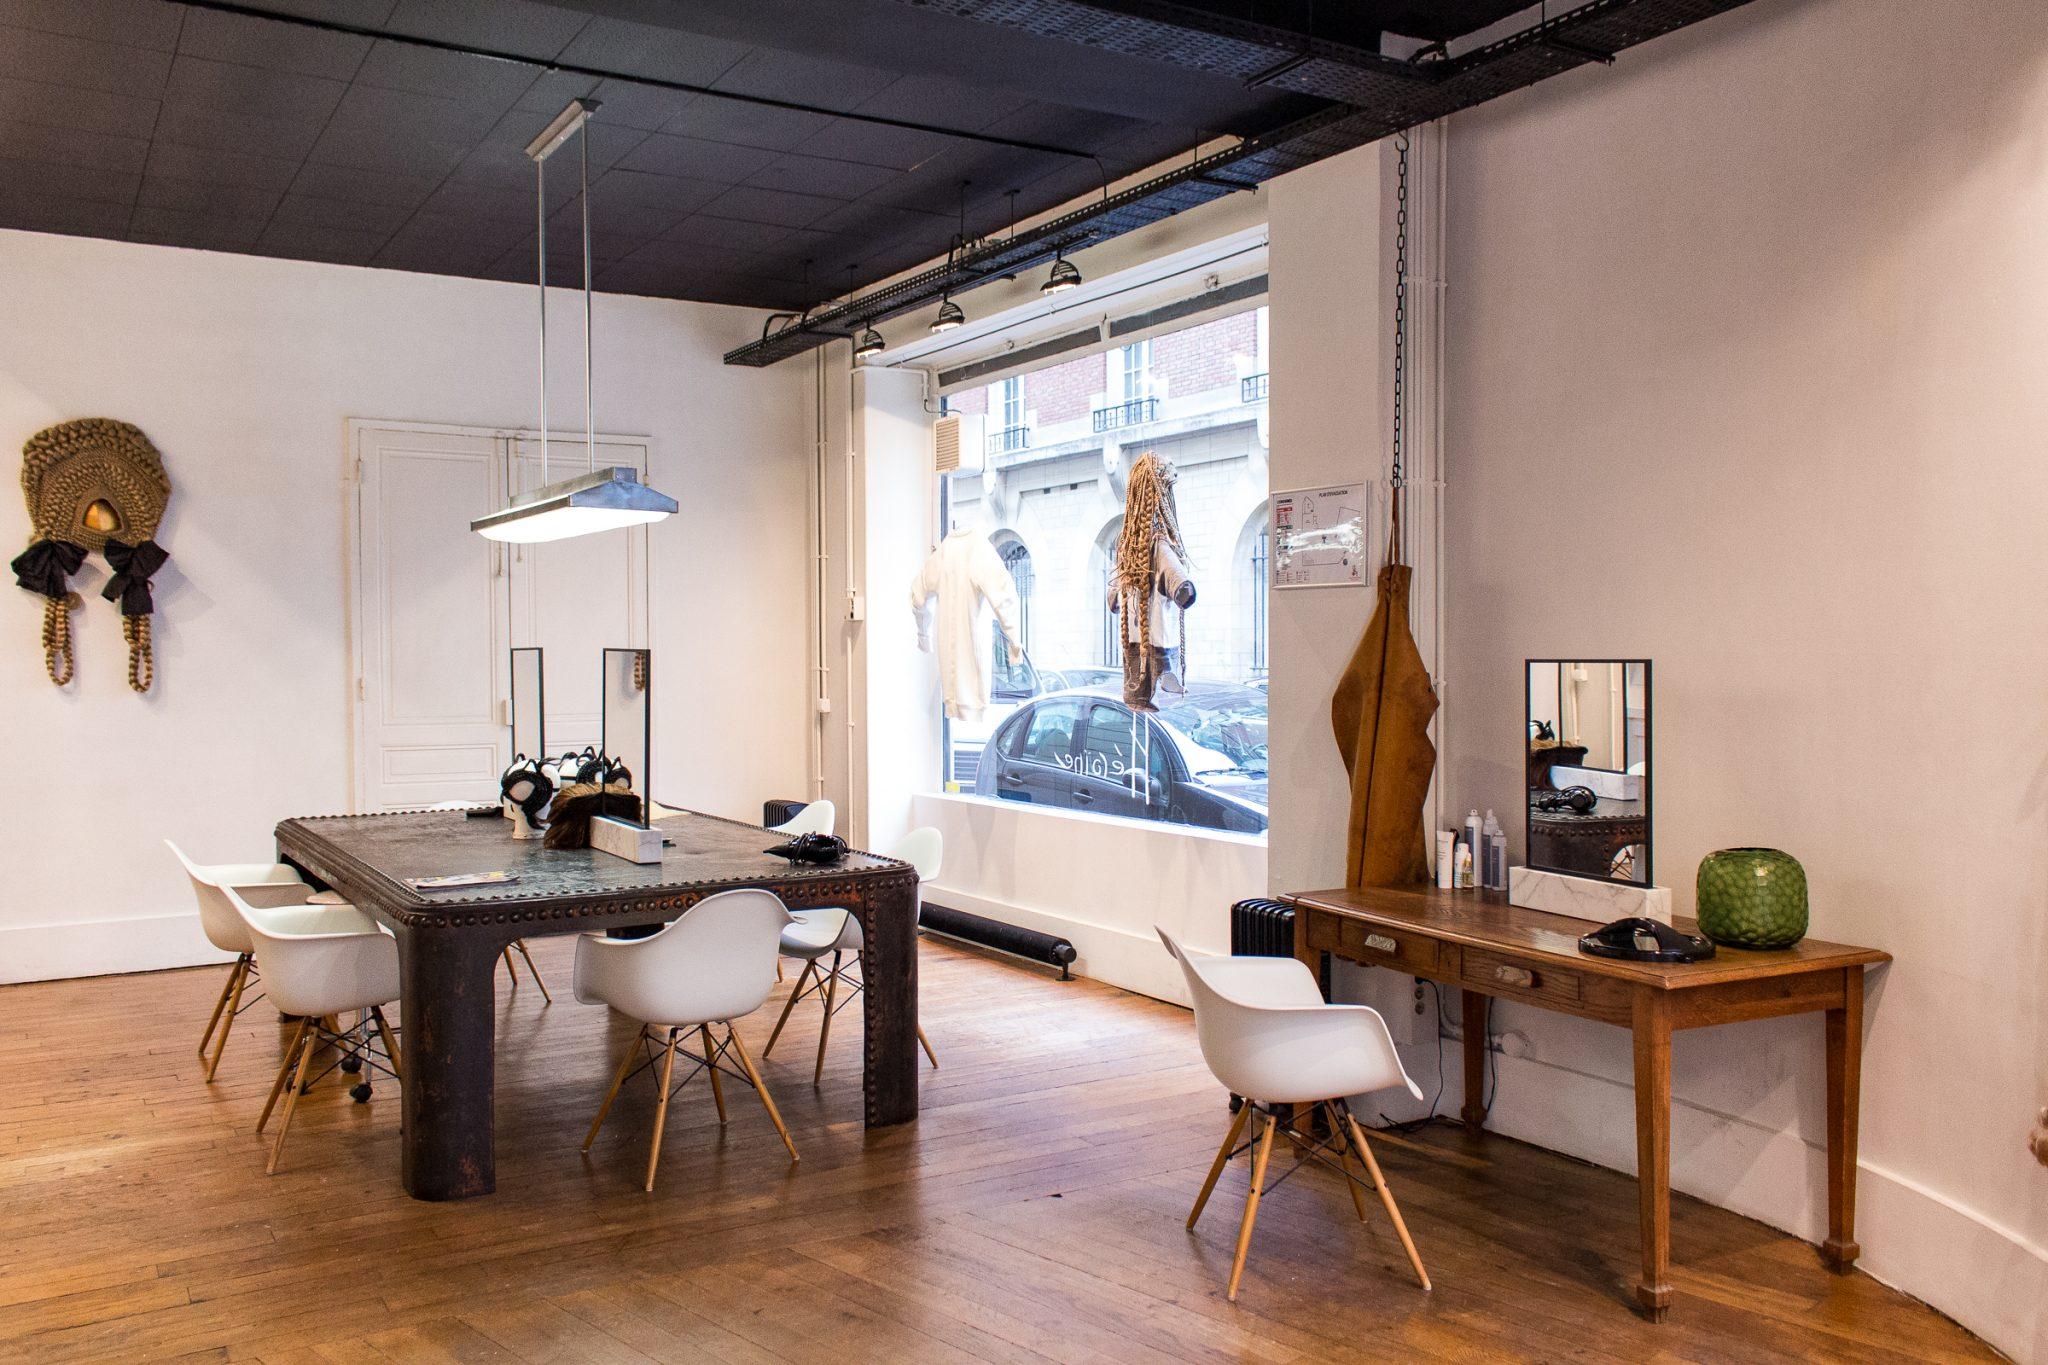 The Best English Speaking Hair Salon in Paris - The Glittering Unknown